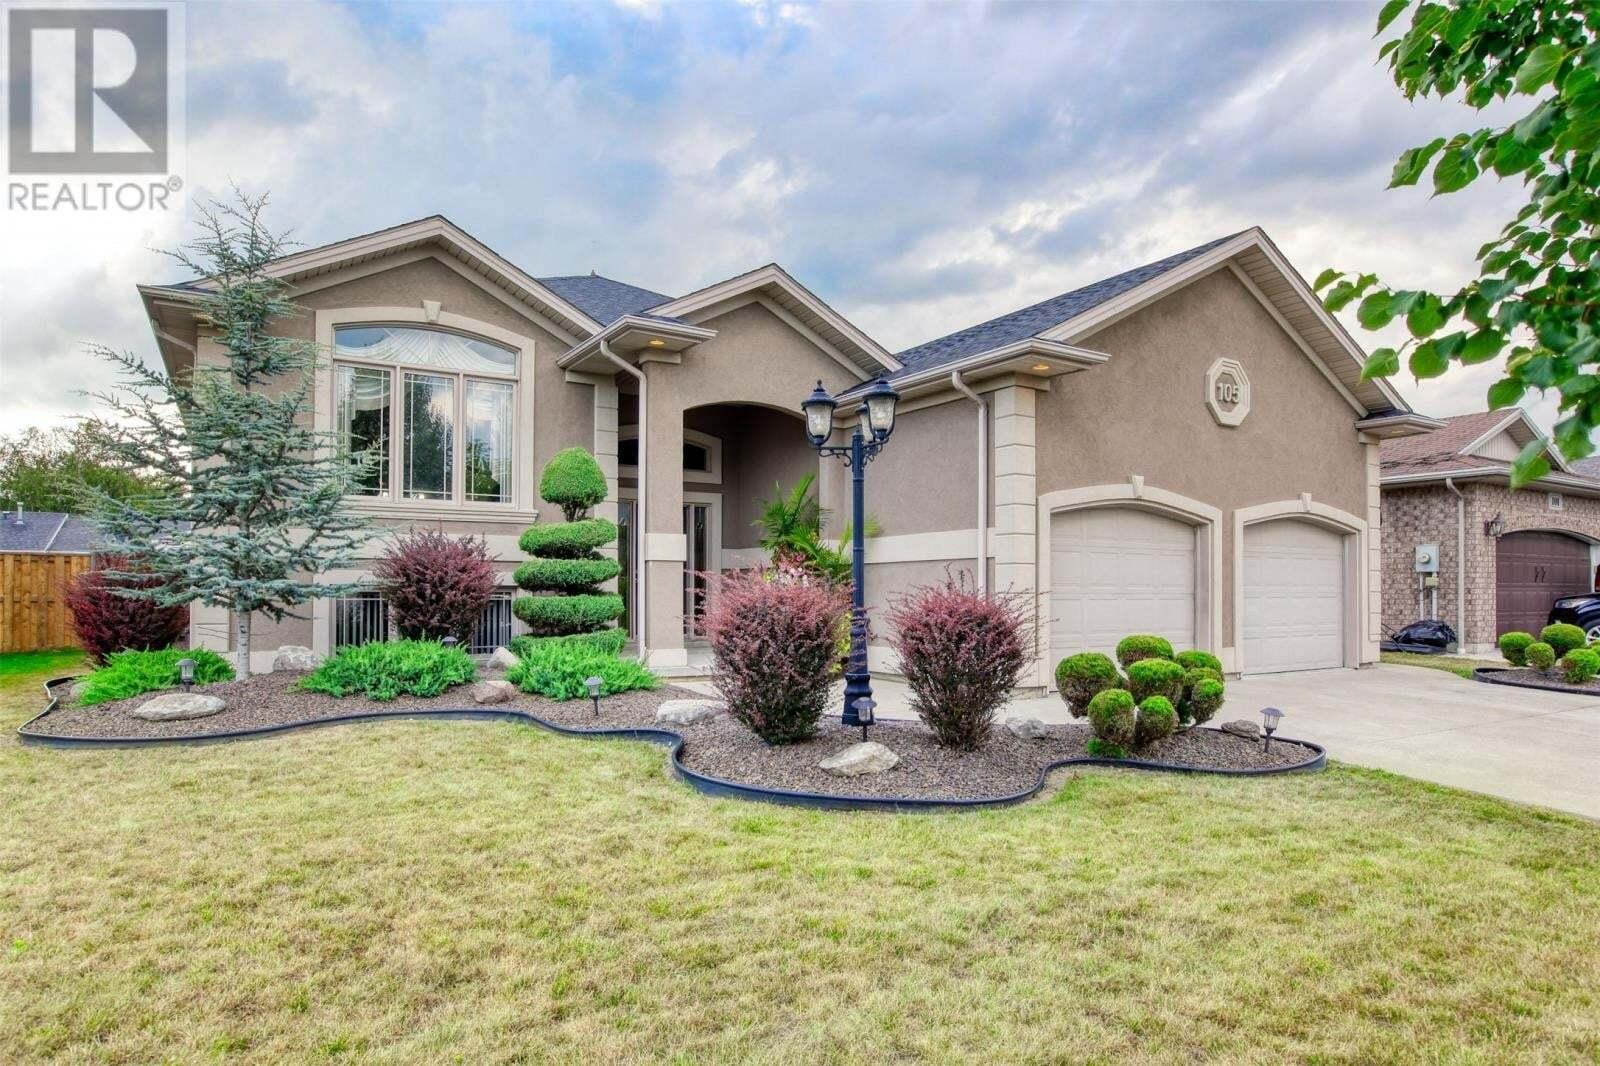 House for sale at 105 Antonio Cres Leamington Ontario - MLS: 20010193